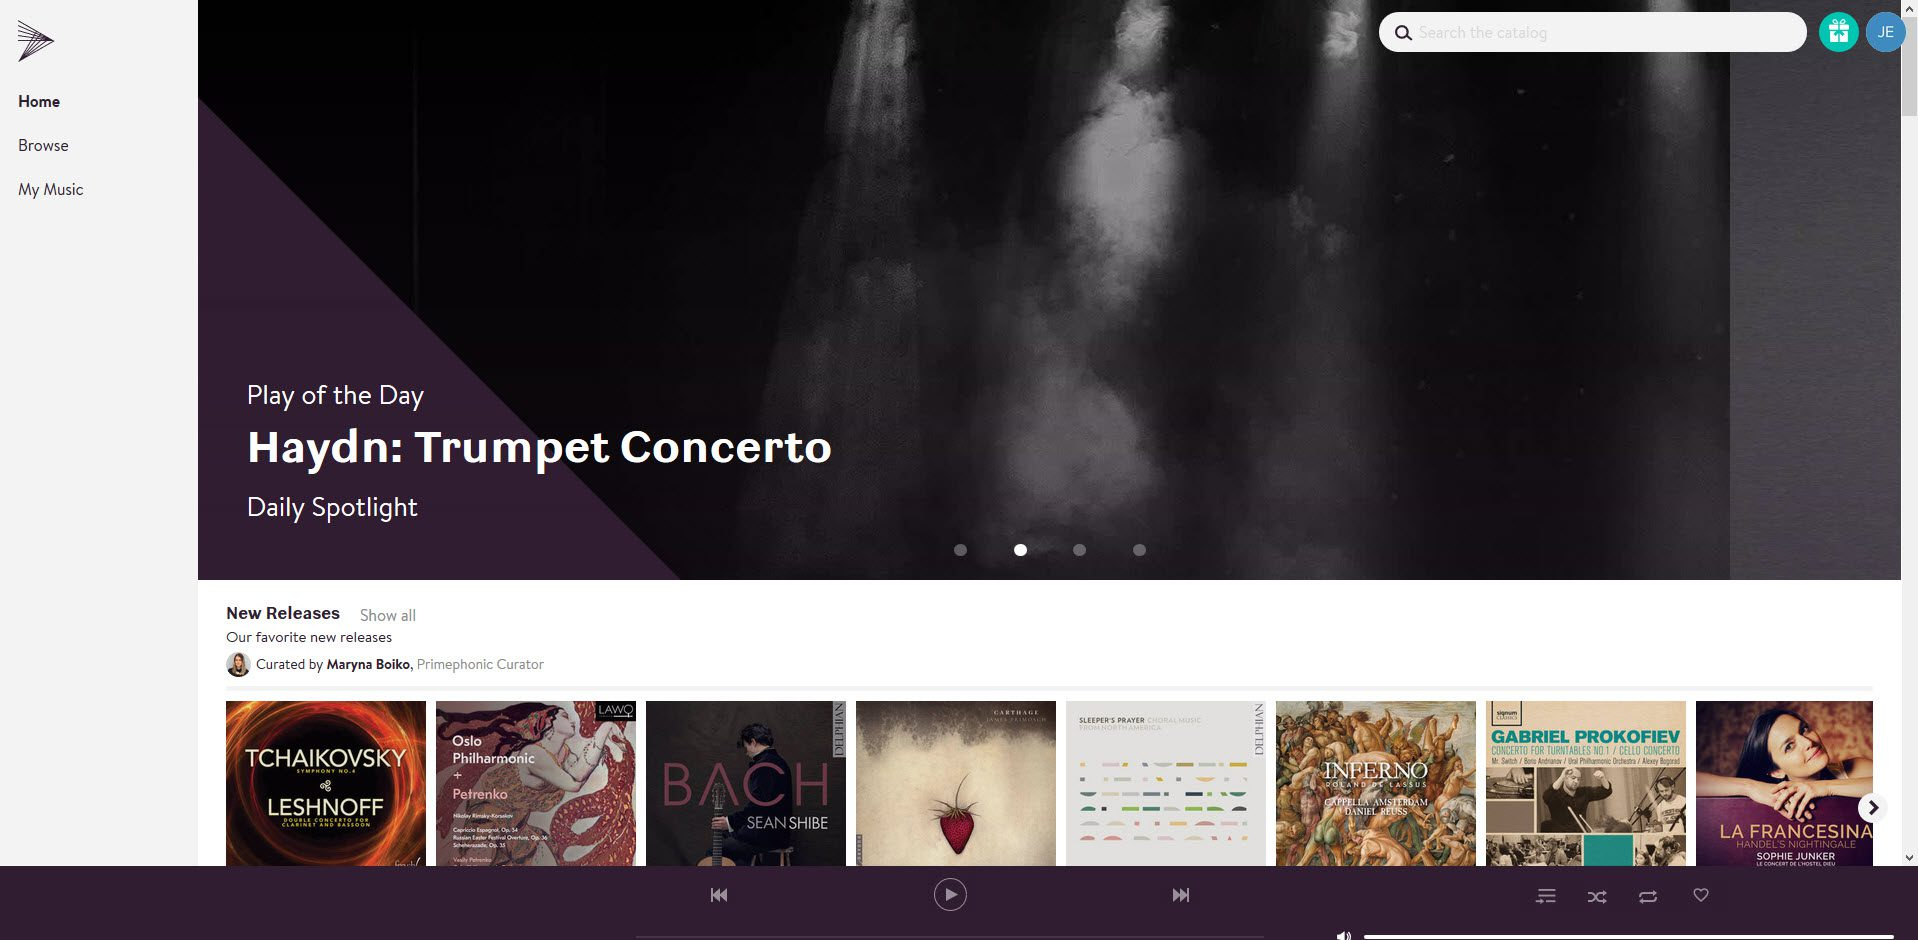 Primephonic webplayer - klassieke muziek streamen - Primephonic classical